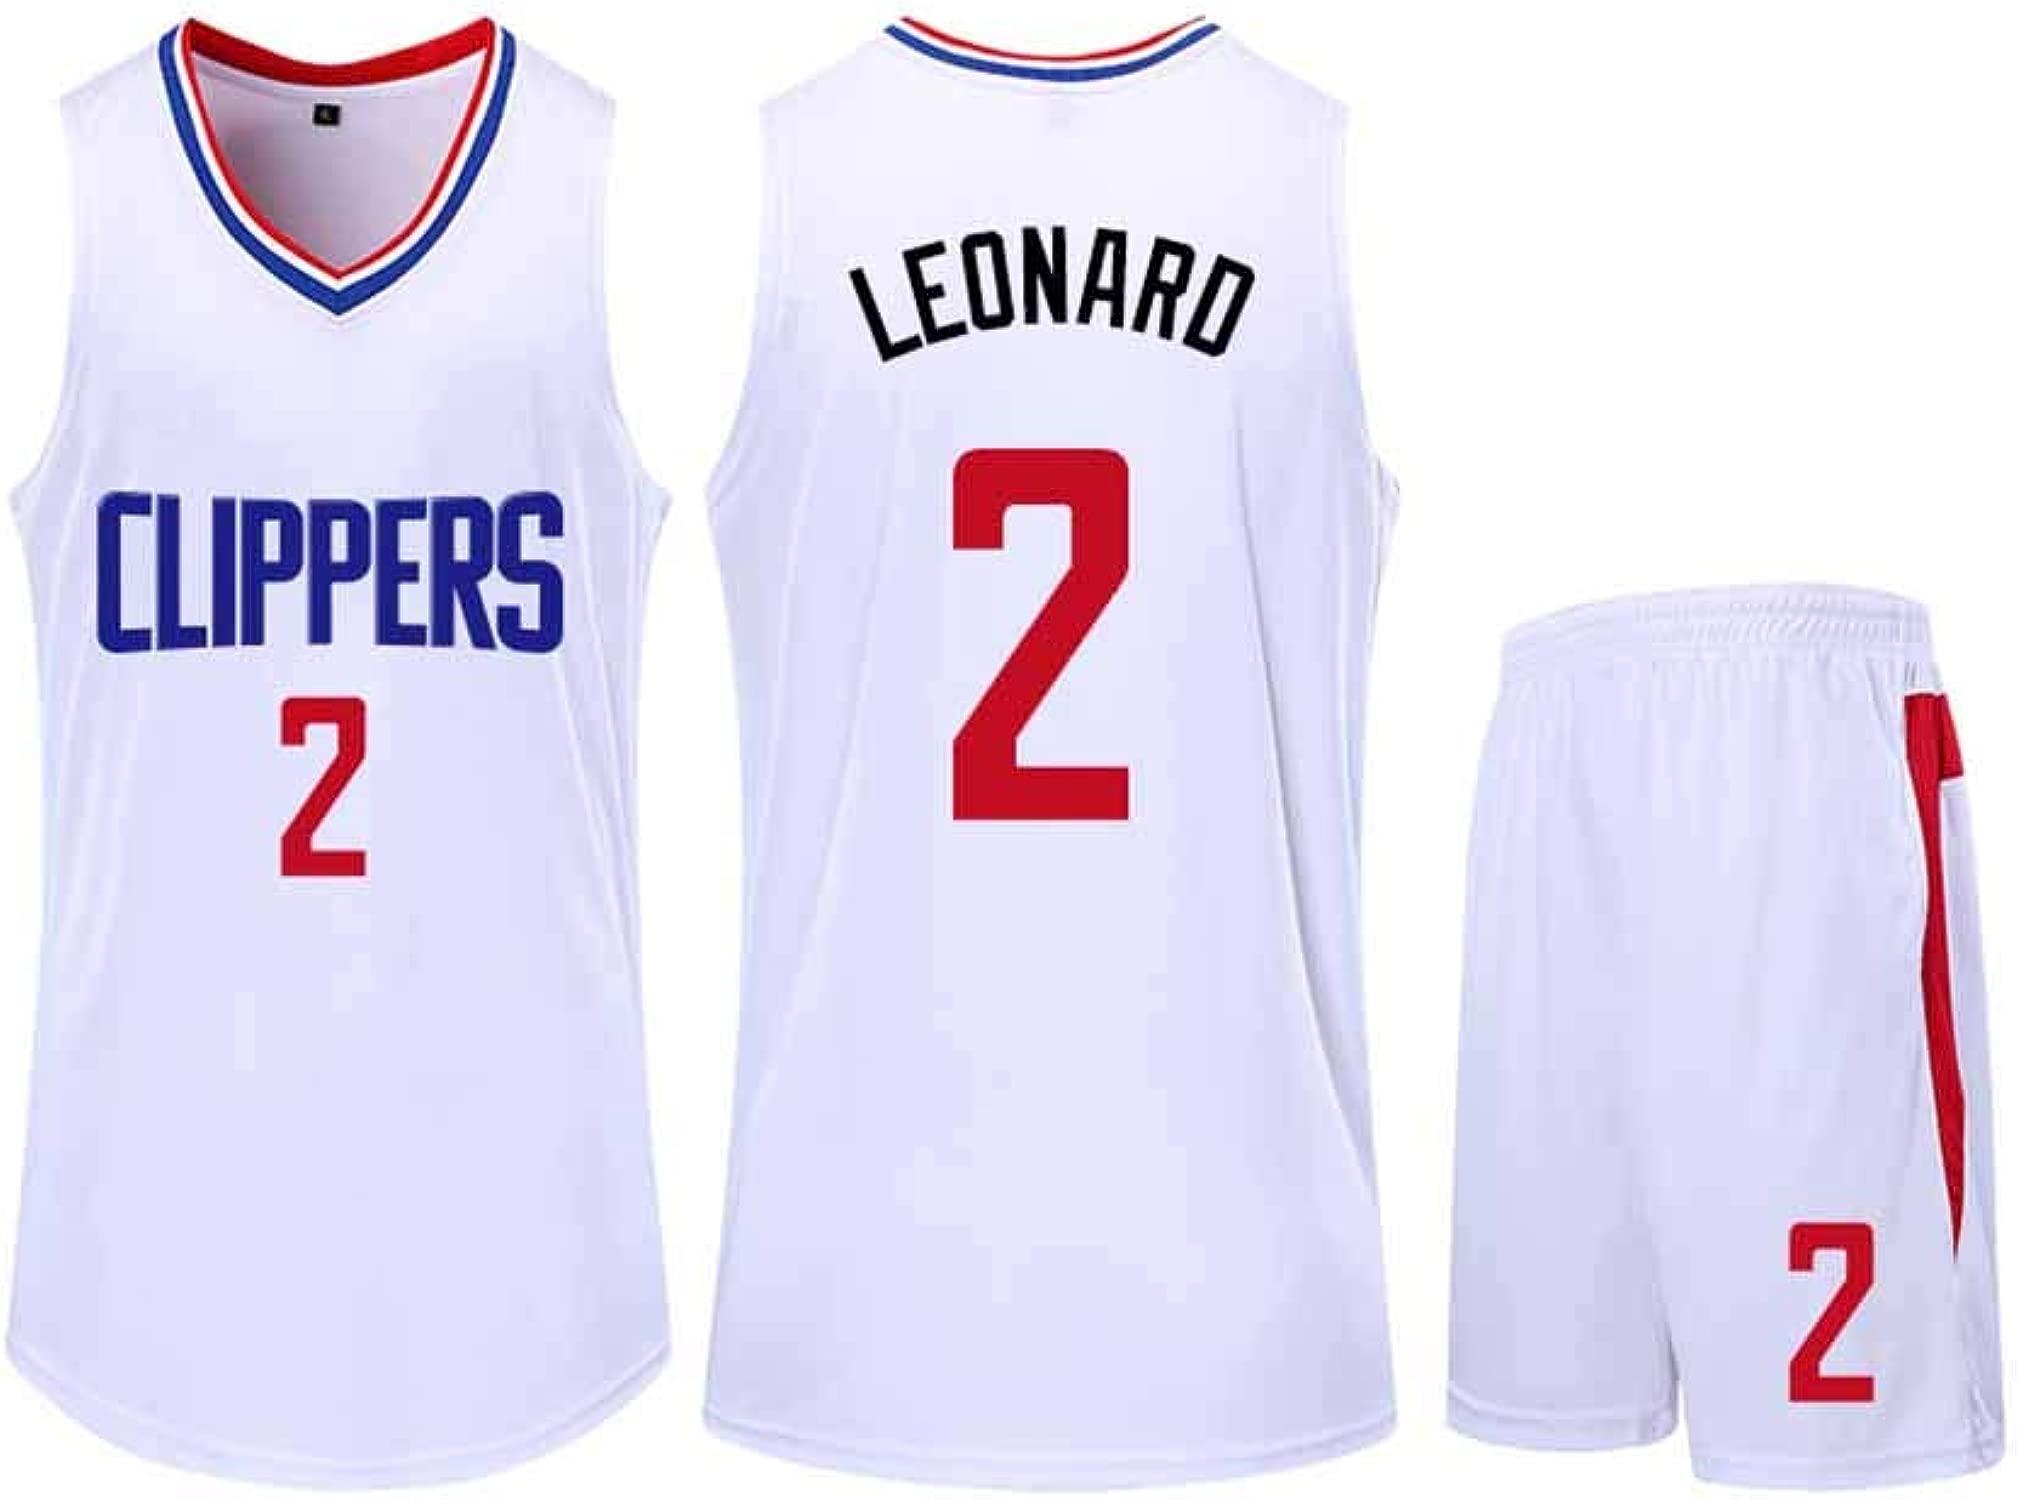 FRYP Clippers No. 2 Leonard Basketball Trikot, Athlete's Jersey Fan Sweatshirt Schnelltrocknendes Mesh Trikot, 3XS-5XL-Weiß-XS